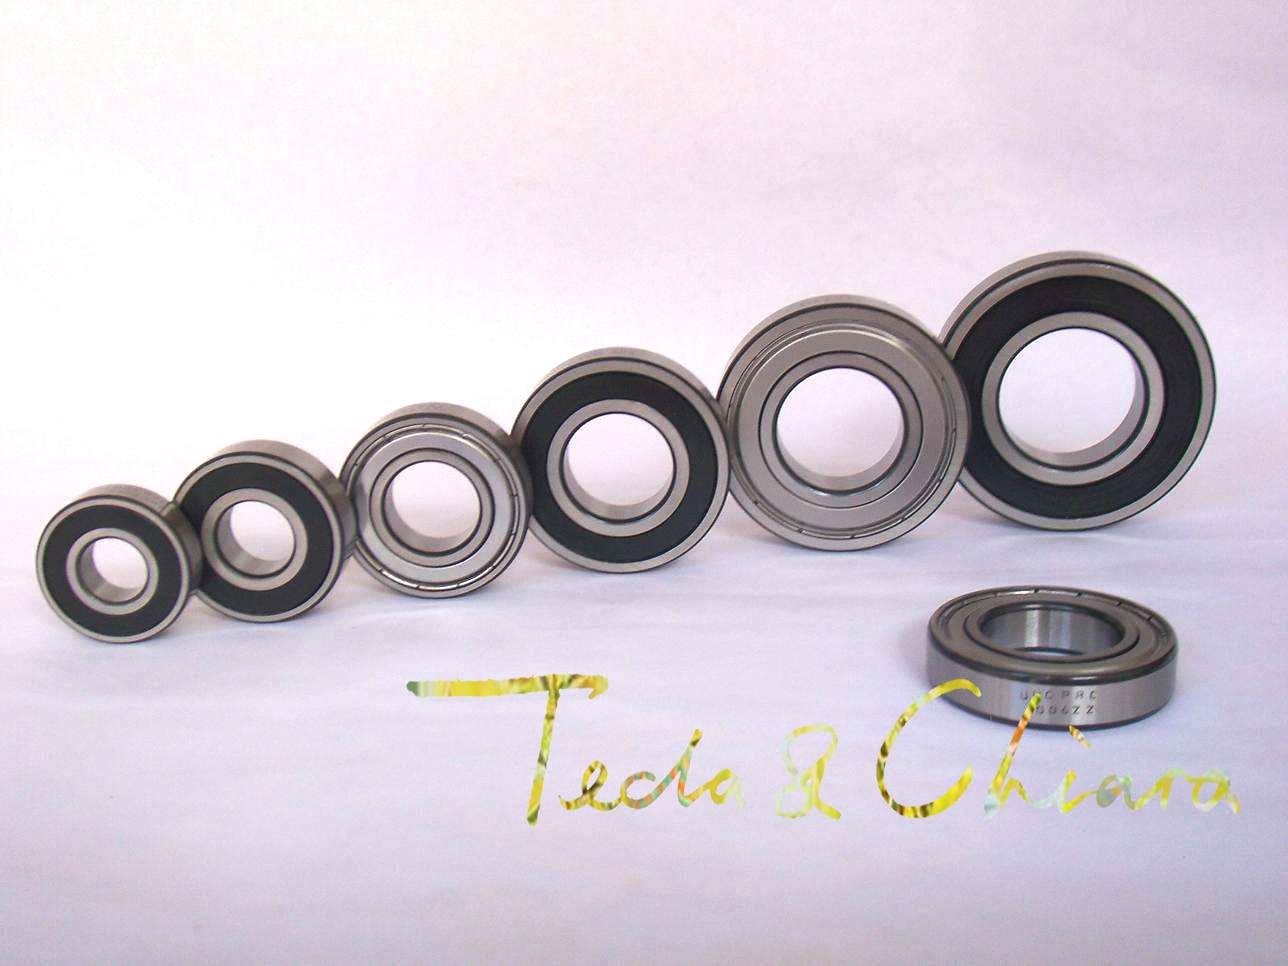 6006 6006ZZ 6006RS 6006-2Z 6006Z 6006-2RS ZZ RS RZ 2RZ Deep Groove Ball Bearings 30 x 55 x 13mm High Quality thin 6818 2rs rs ball bearings 6818rs 90 x 115 x 13mm